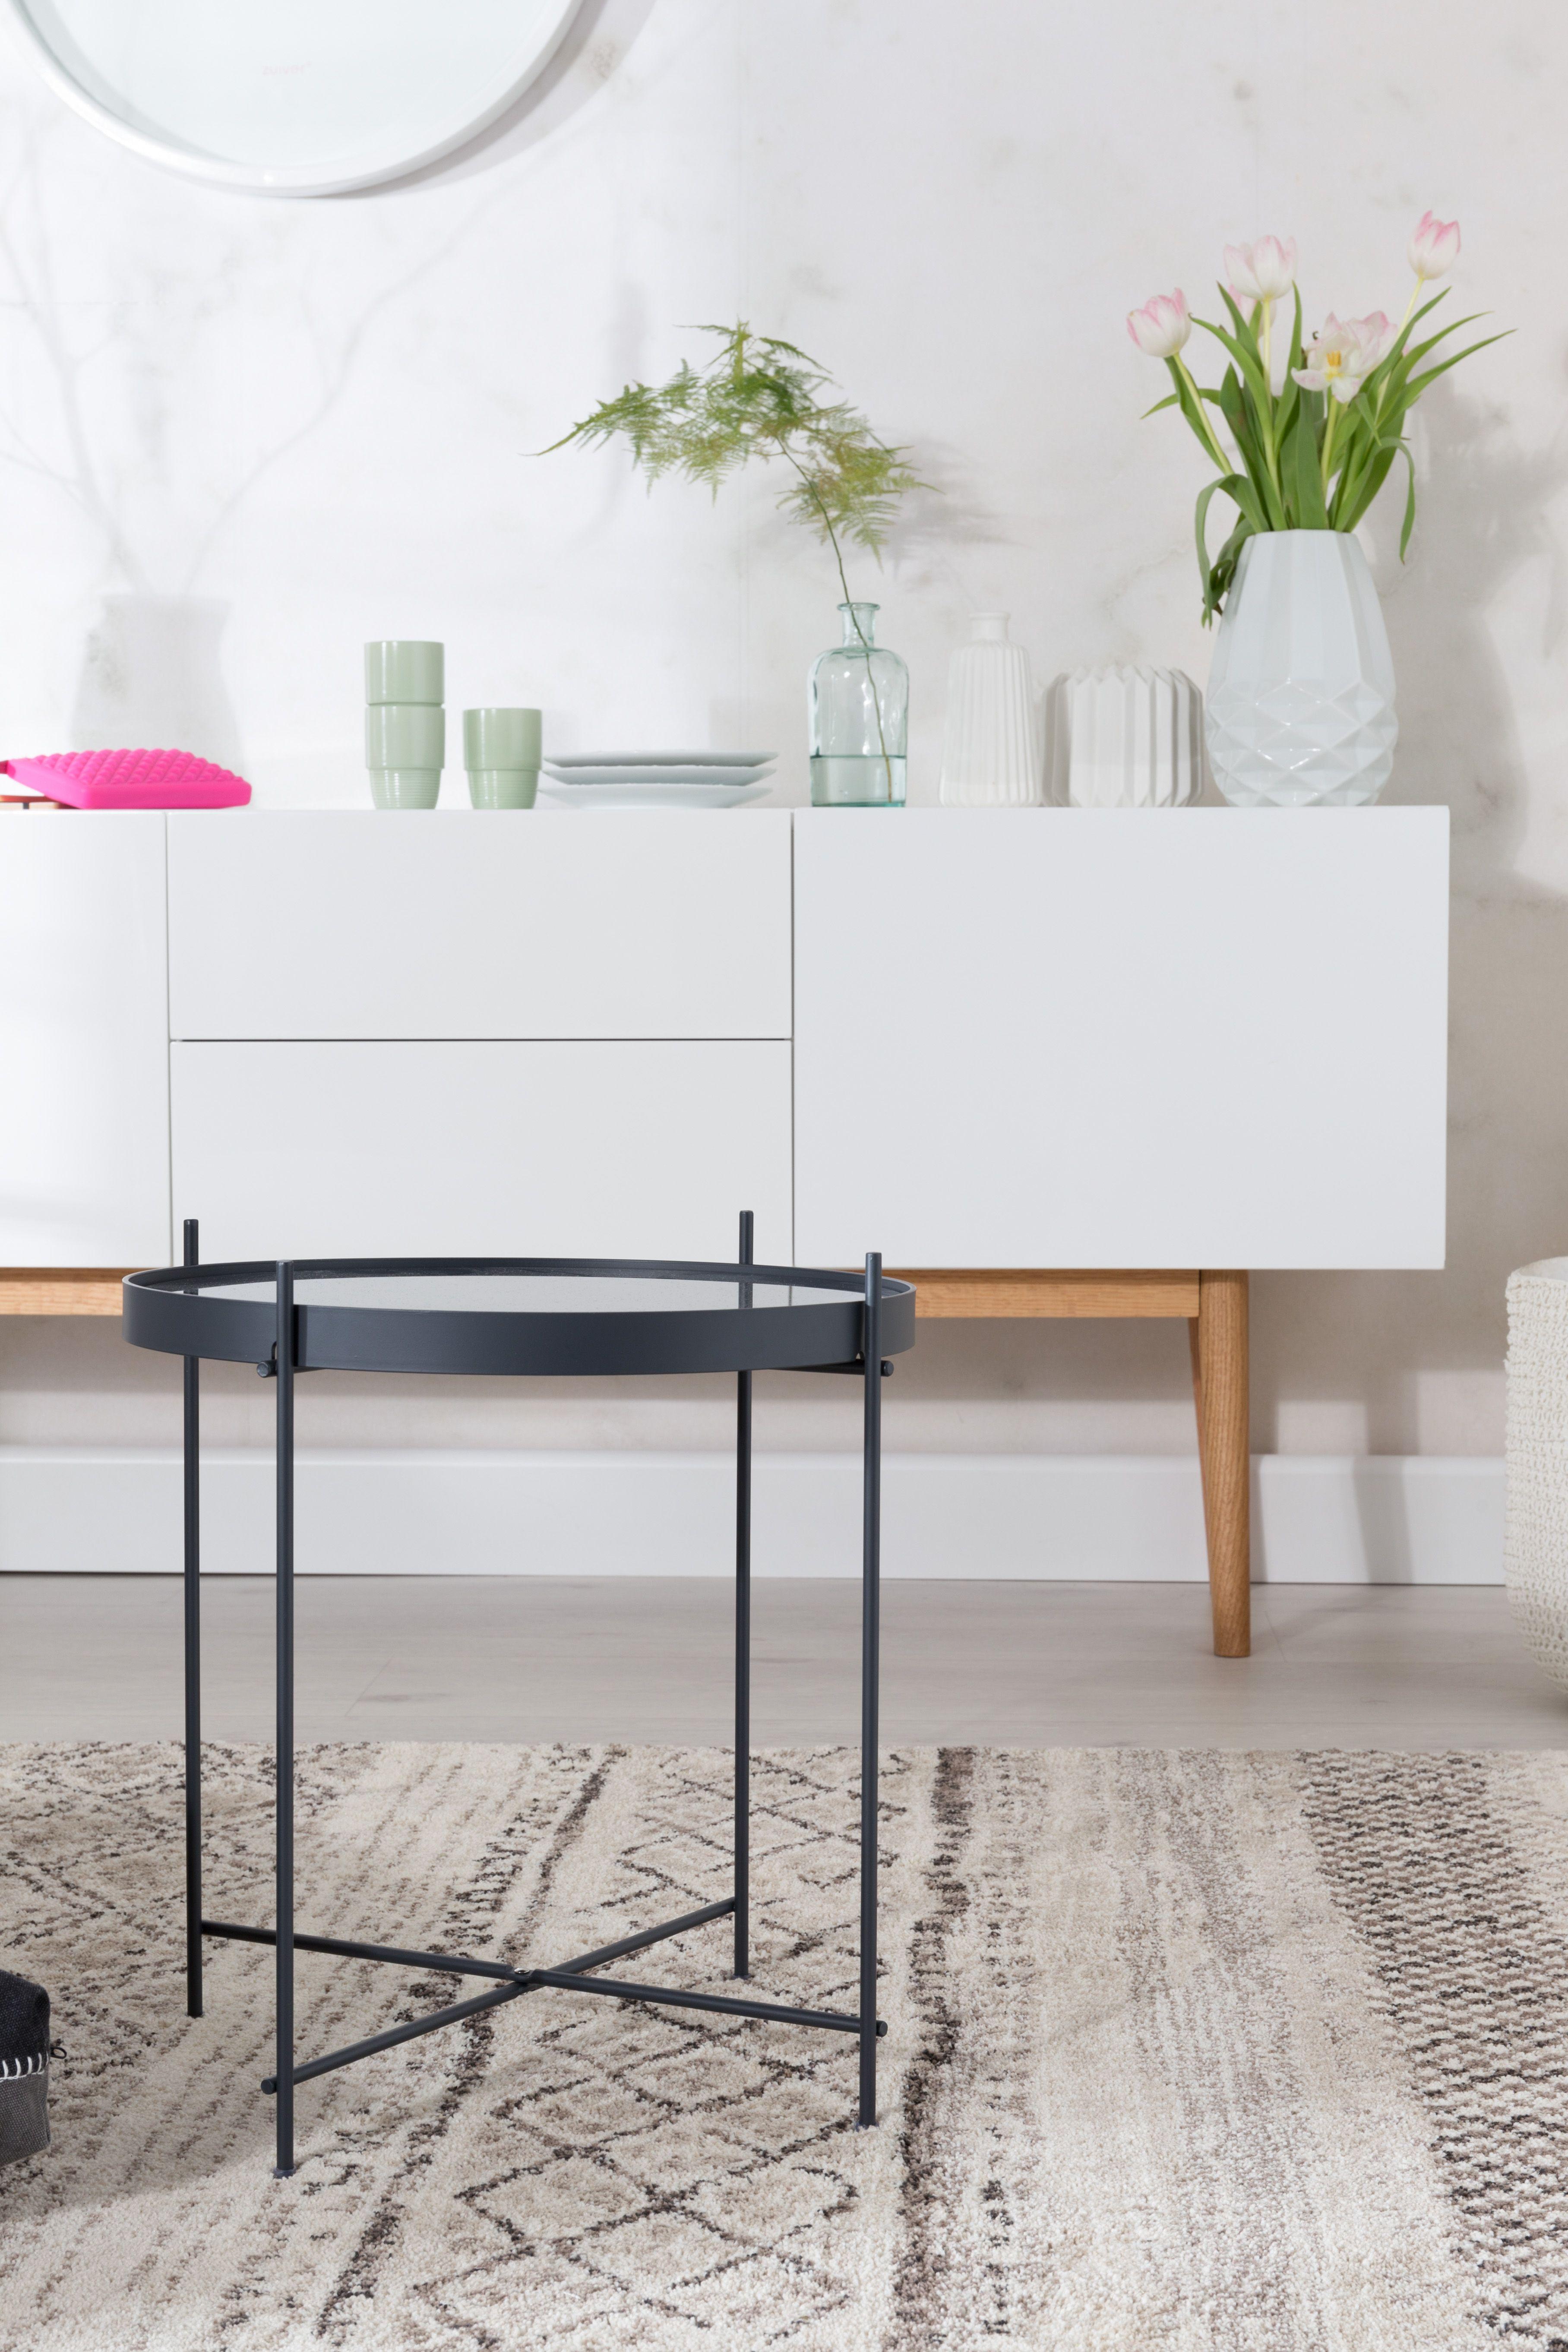 Nieuwe Side Table.Cupid Side Table Zuiver Living Room Wit Dressoir